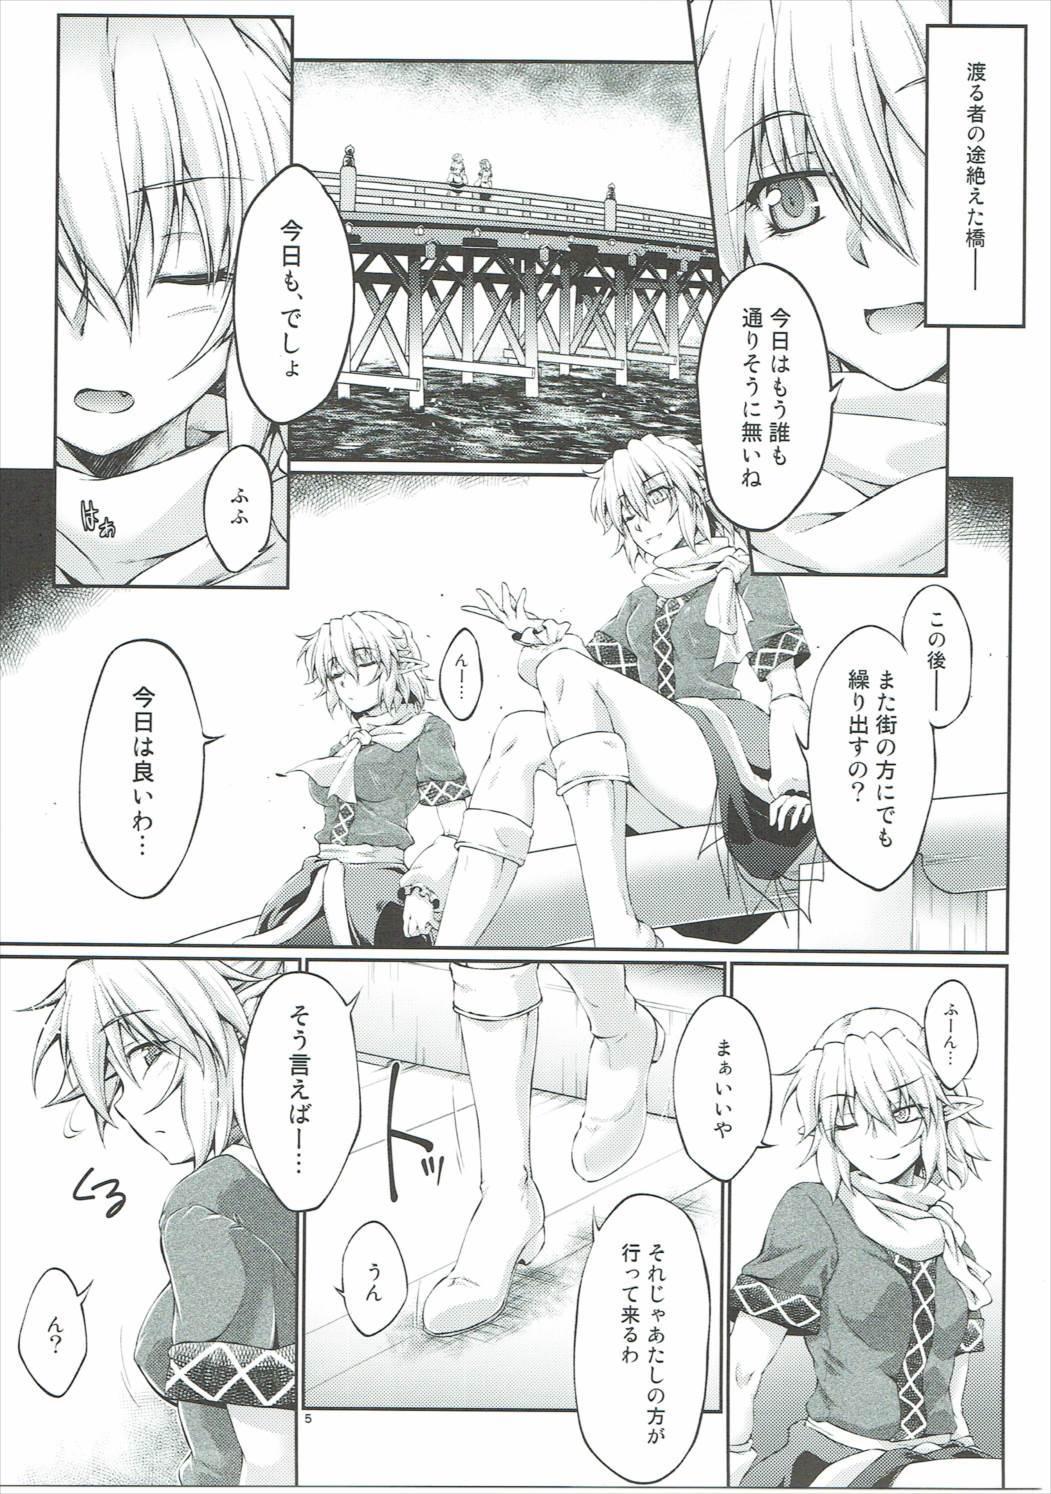 Hashihime Jougi 3